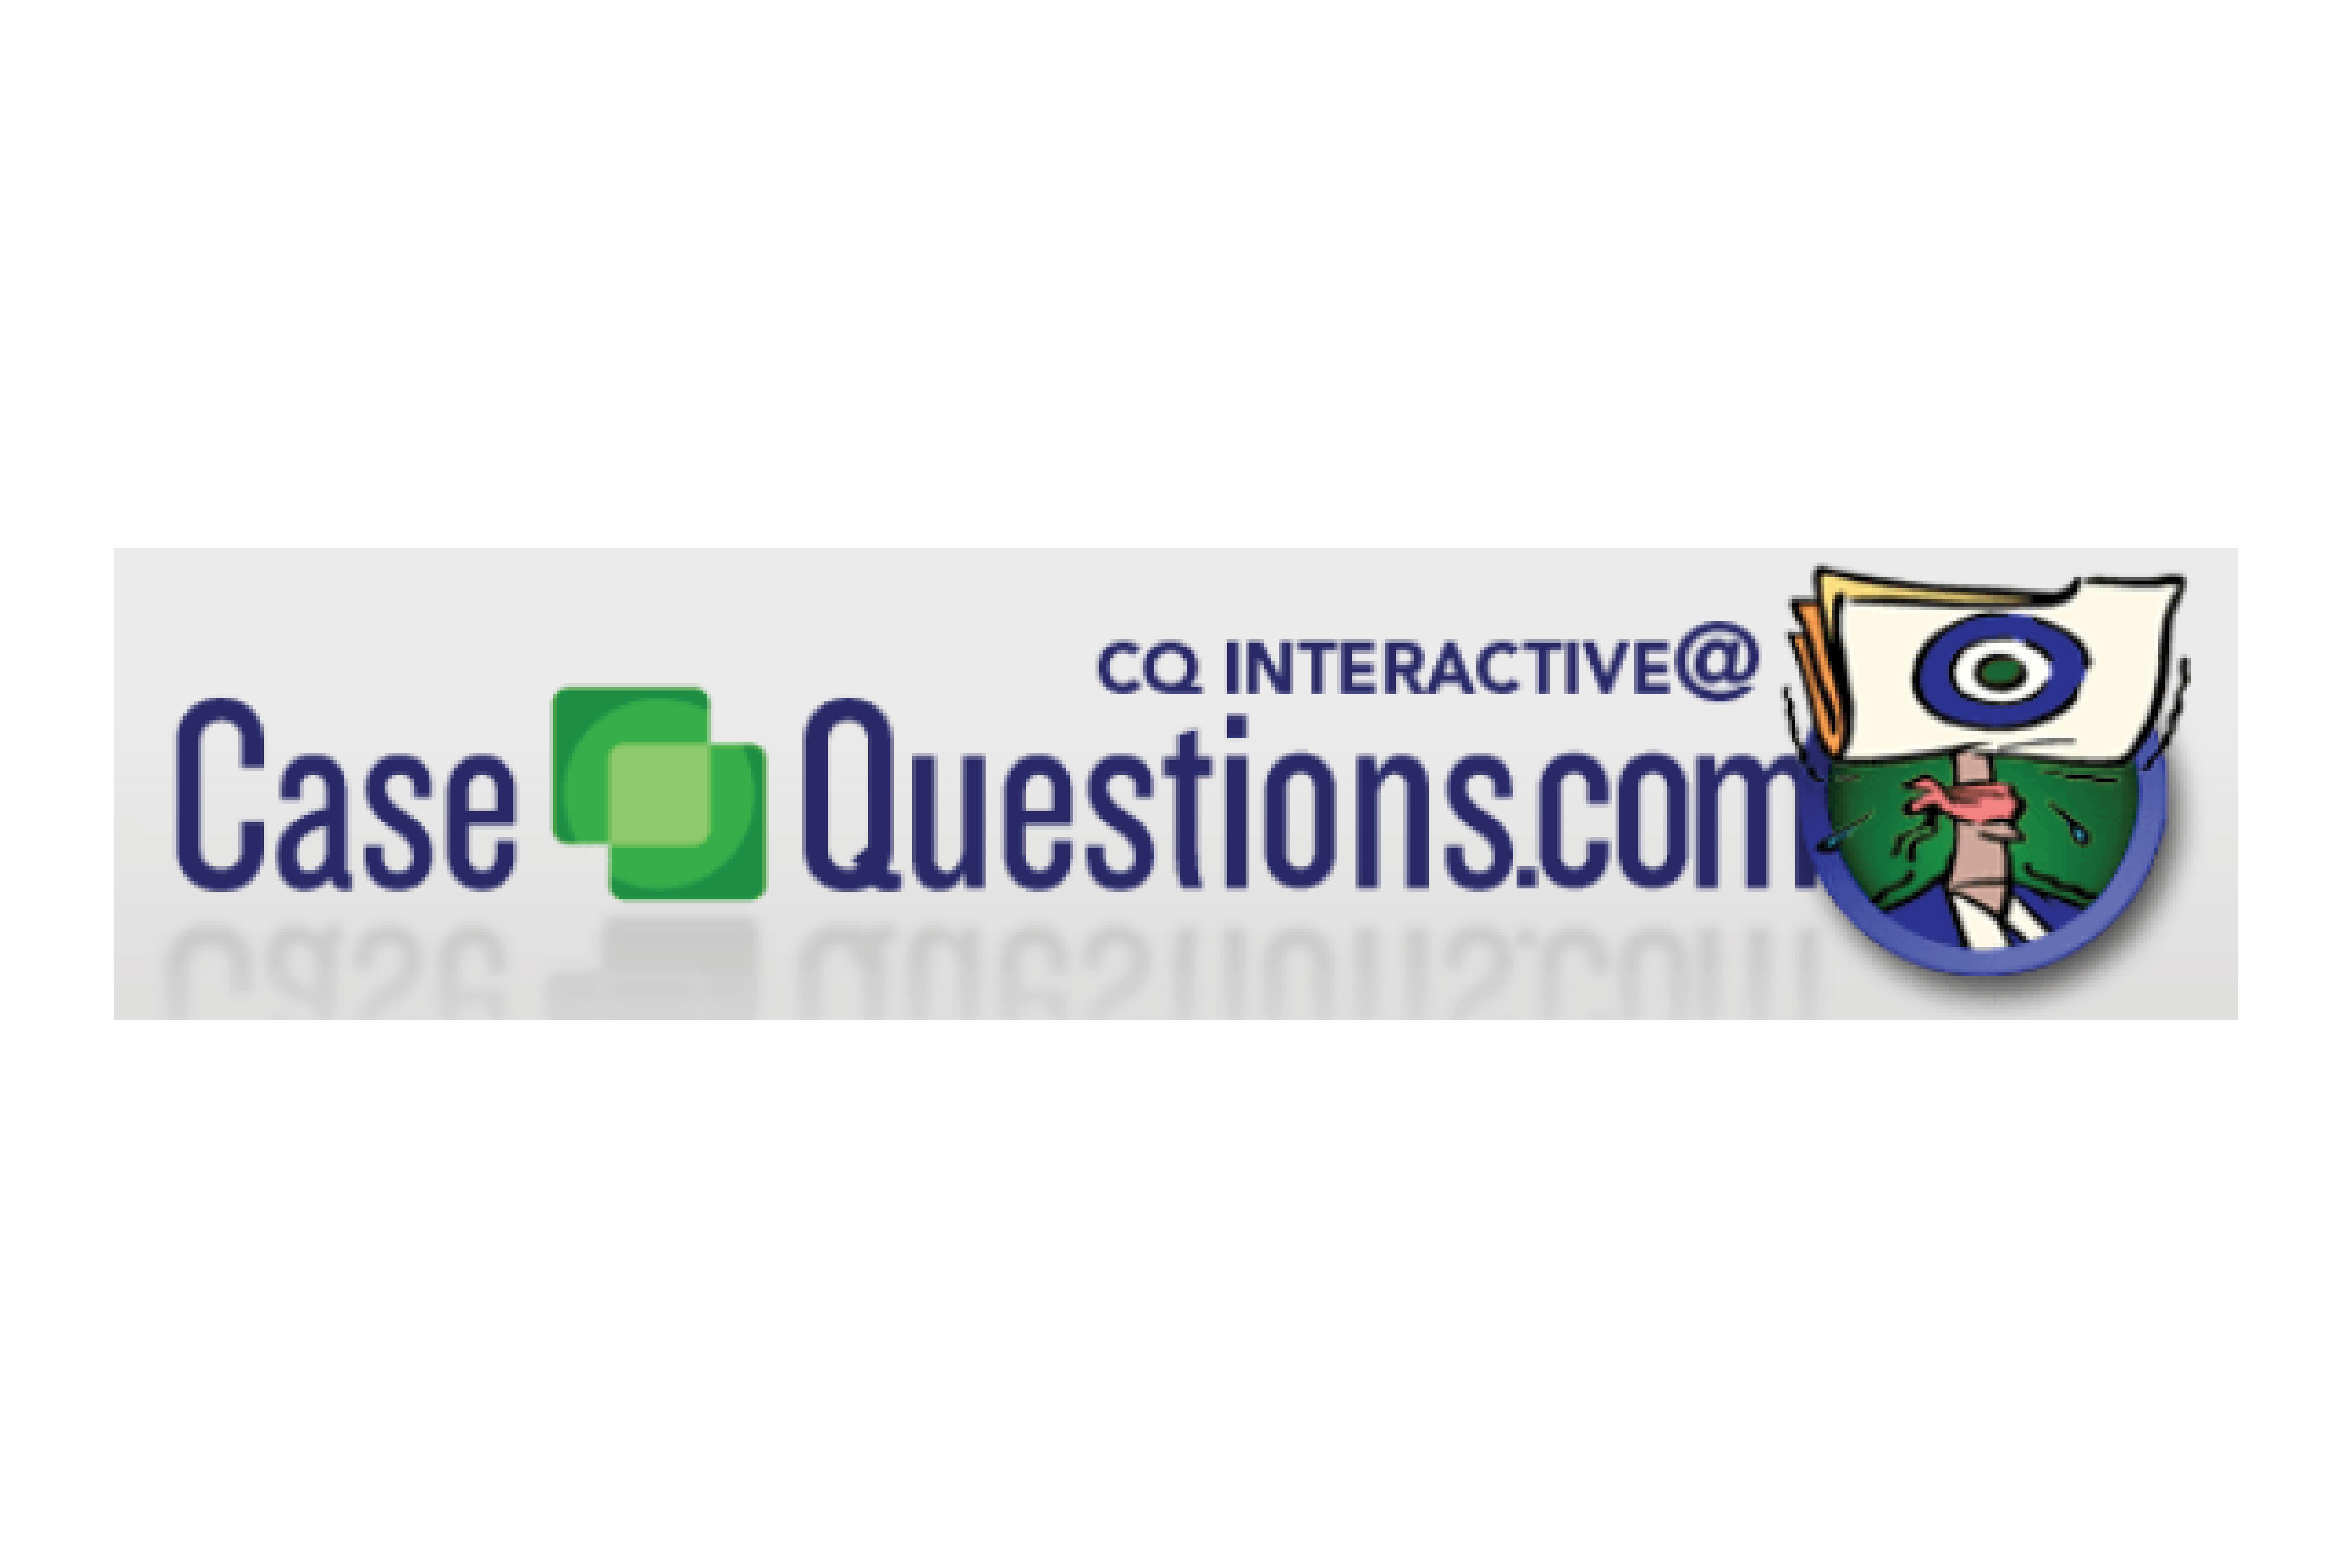 CQ Interactive link